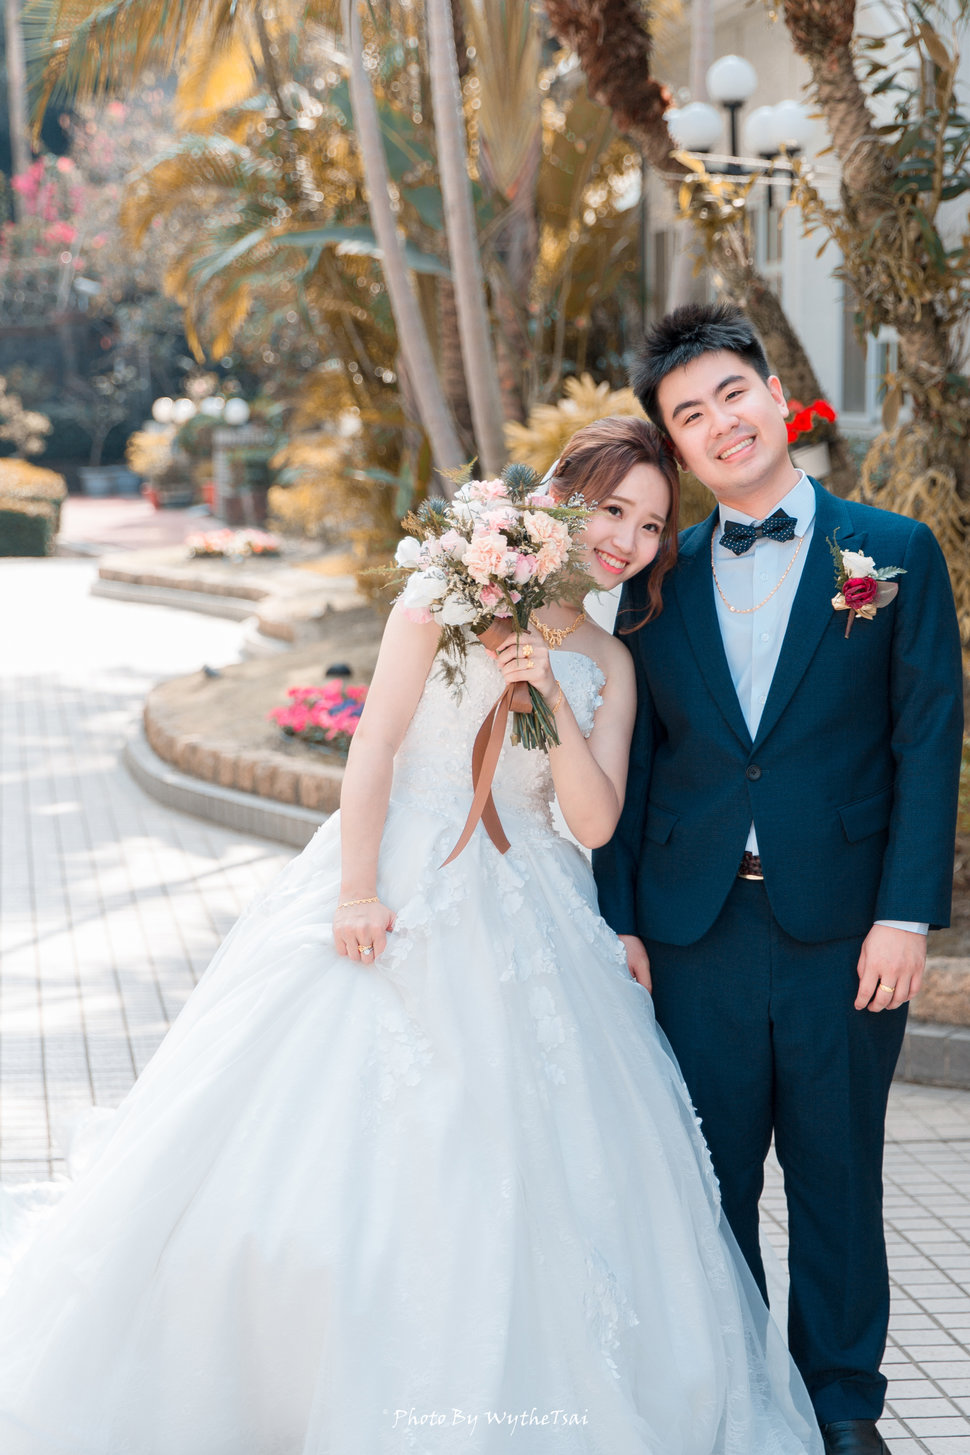 1123婚禮紀錄-1 - 婚攝偉興 L&yours《結婚吧》